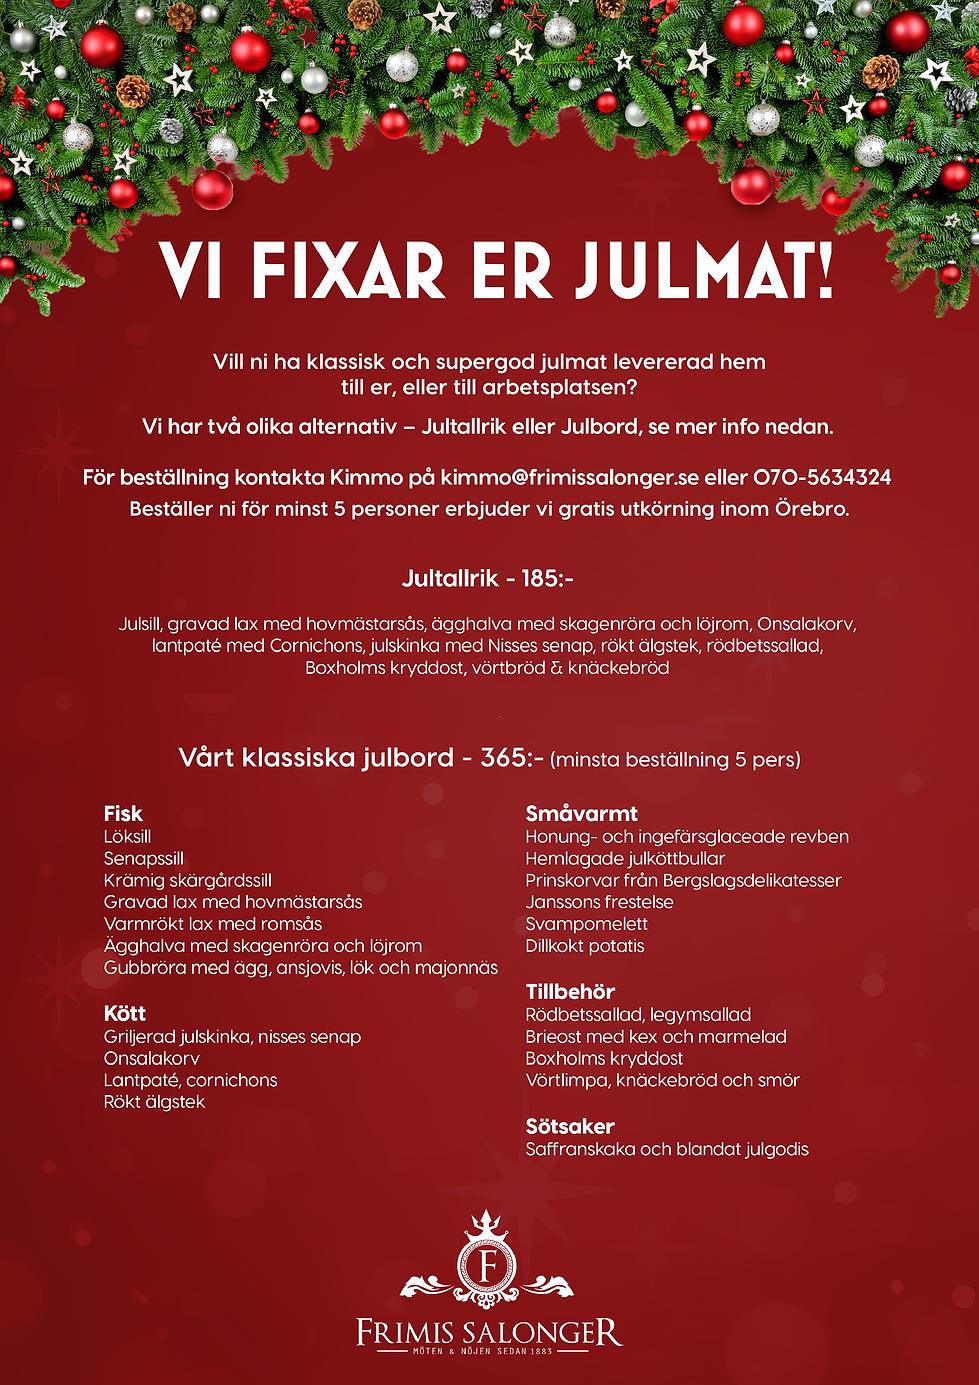 frimis_julcatering_webb.png